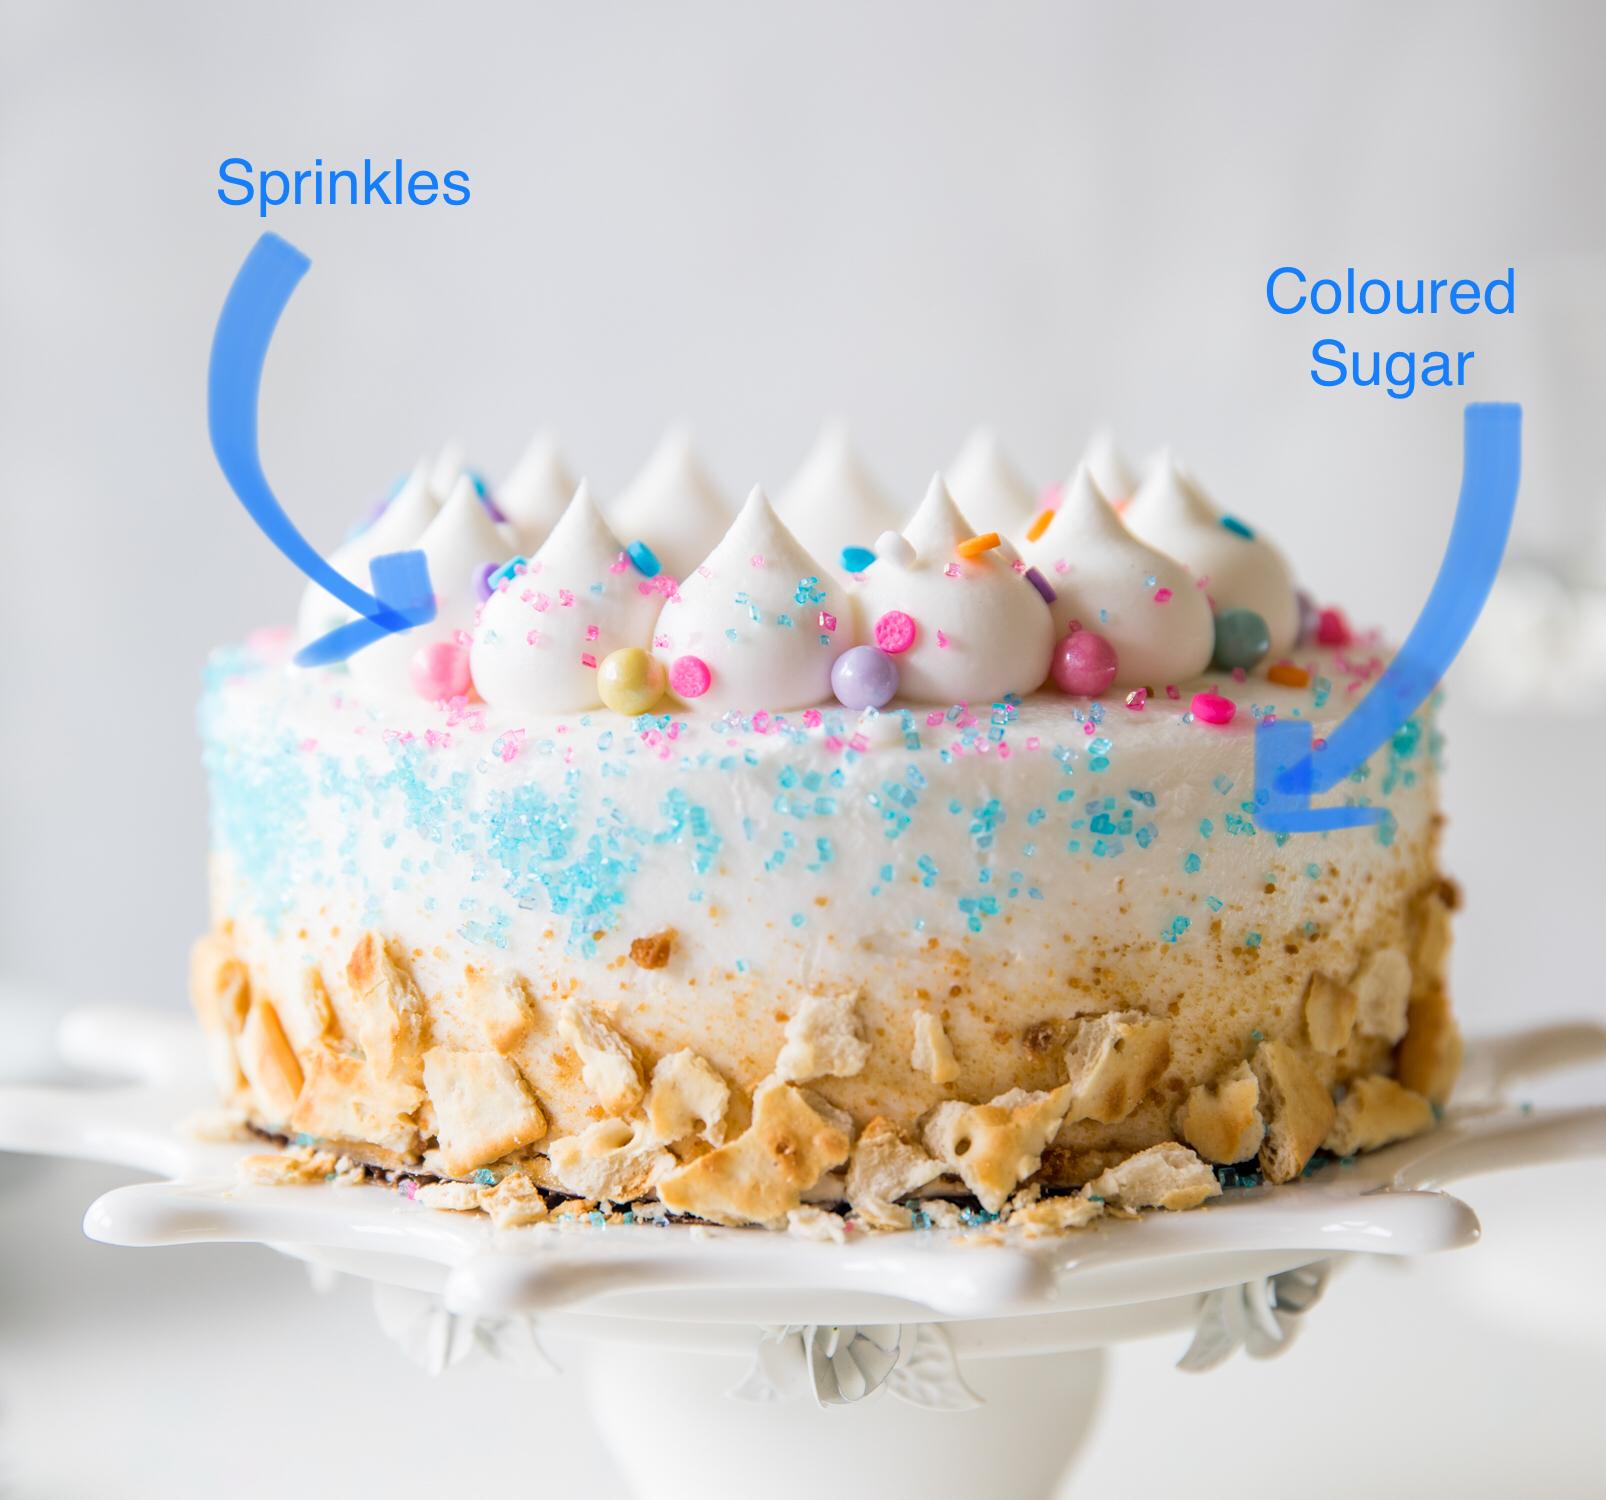 maha-munaf-food-photography-askmahamonday-vanilla-cake (1) (1).jpg